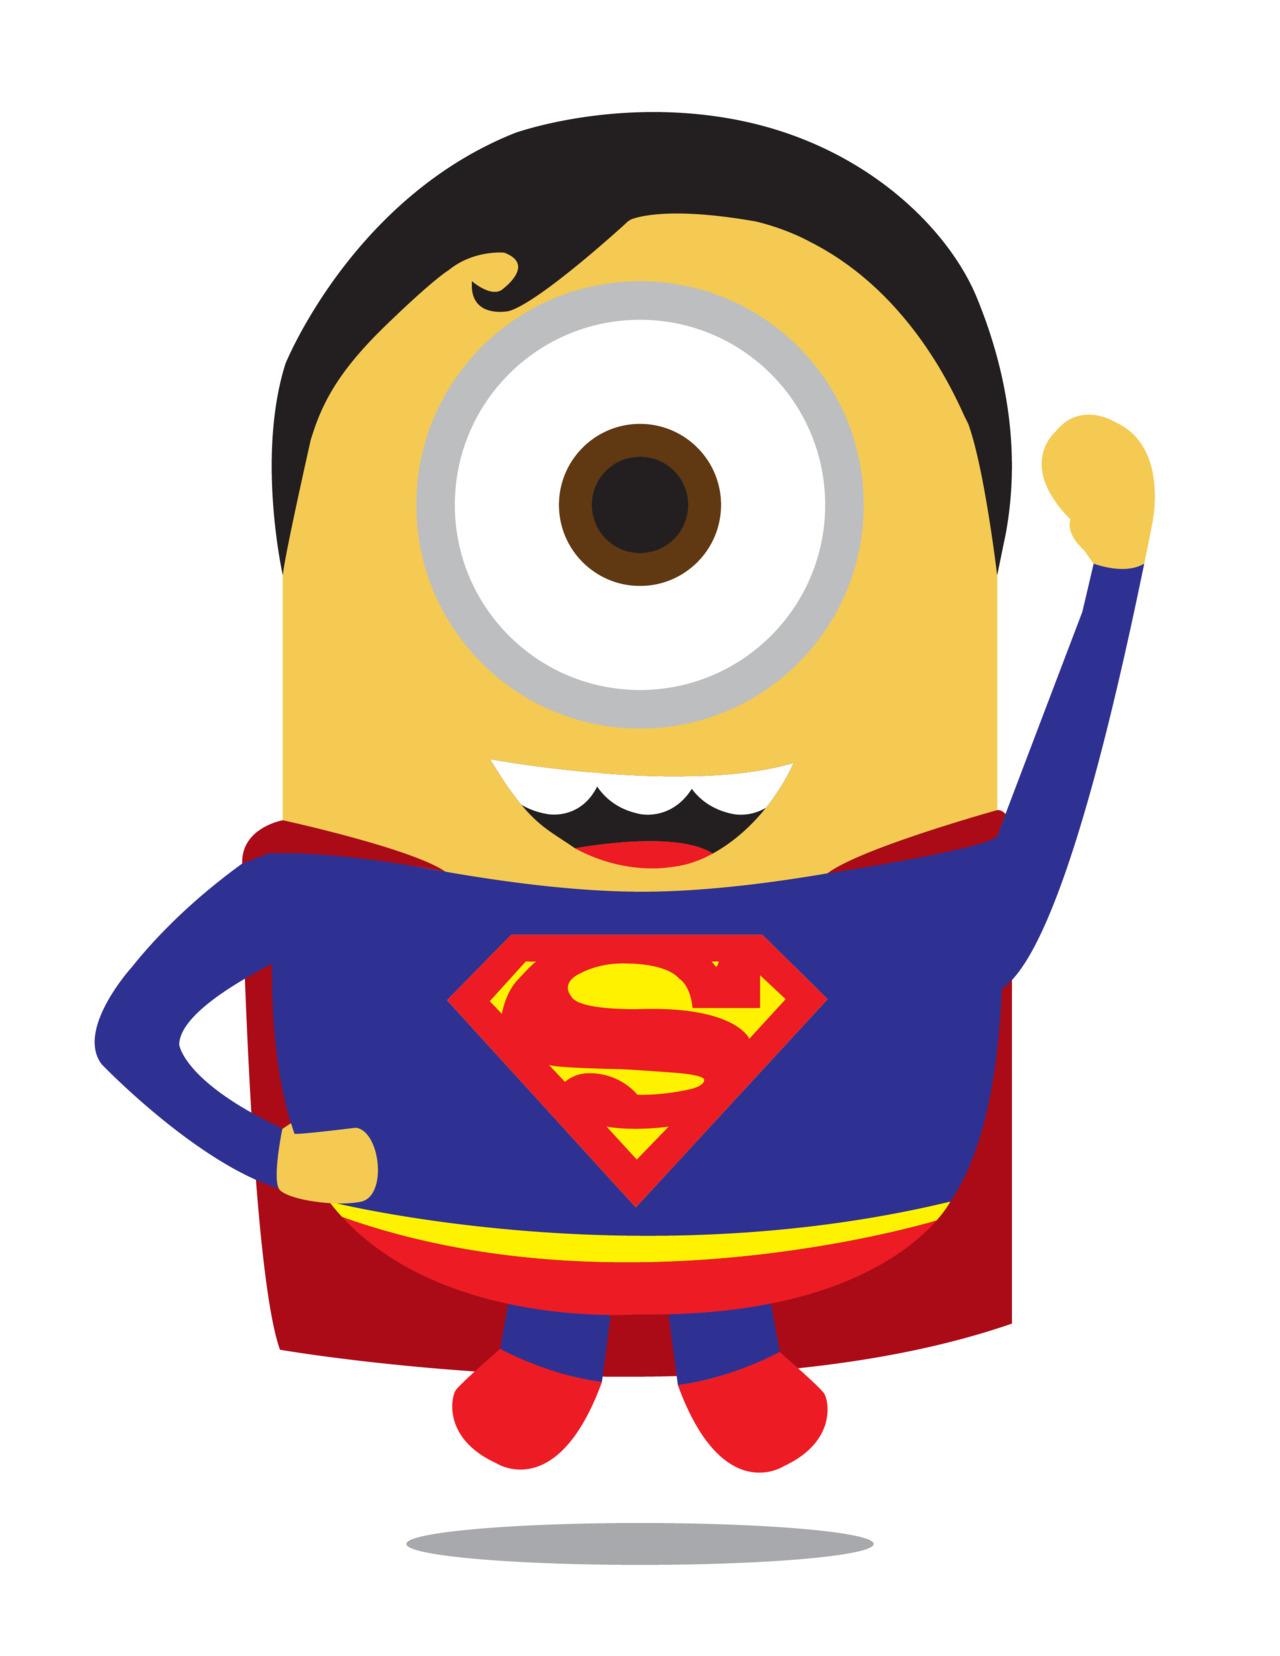 Despicable Me 2 Minions As Adorable Superheroes